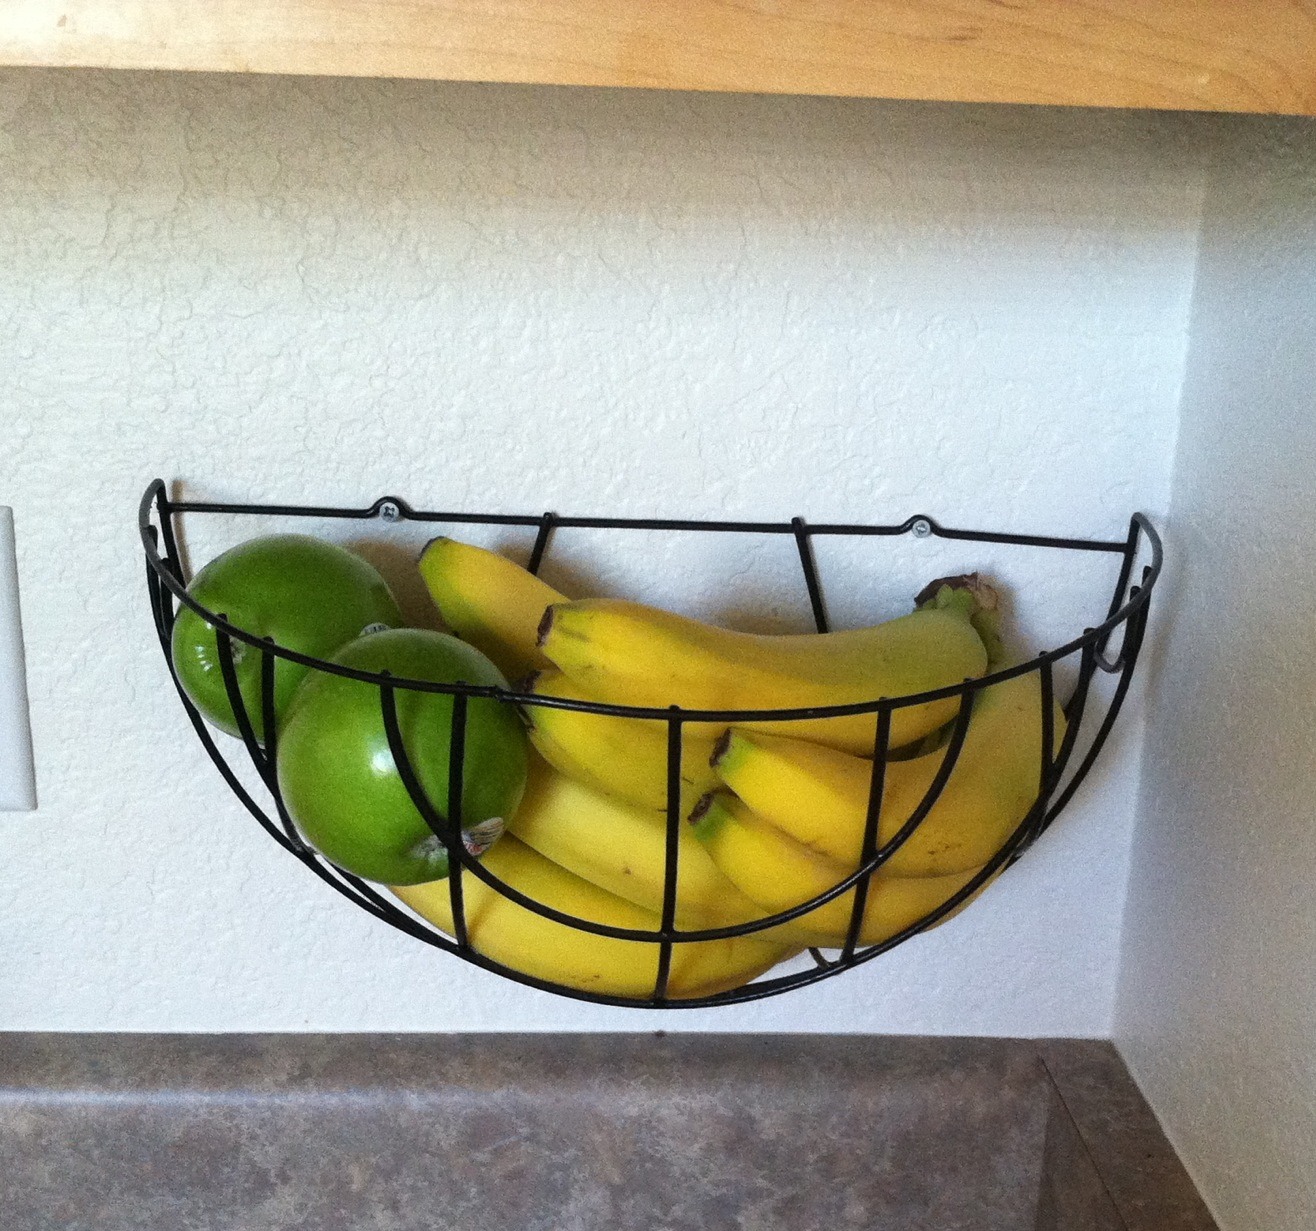 Reorganized Simplicity: Reorganized Home Challenge Week #3